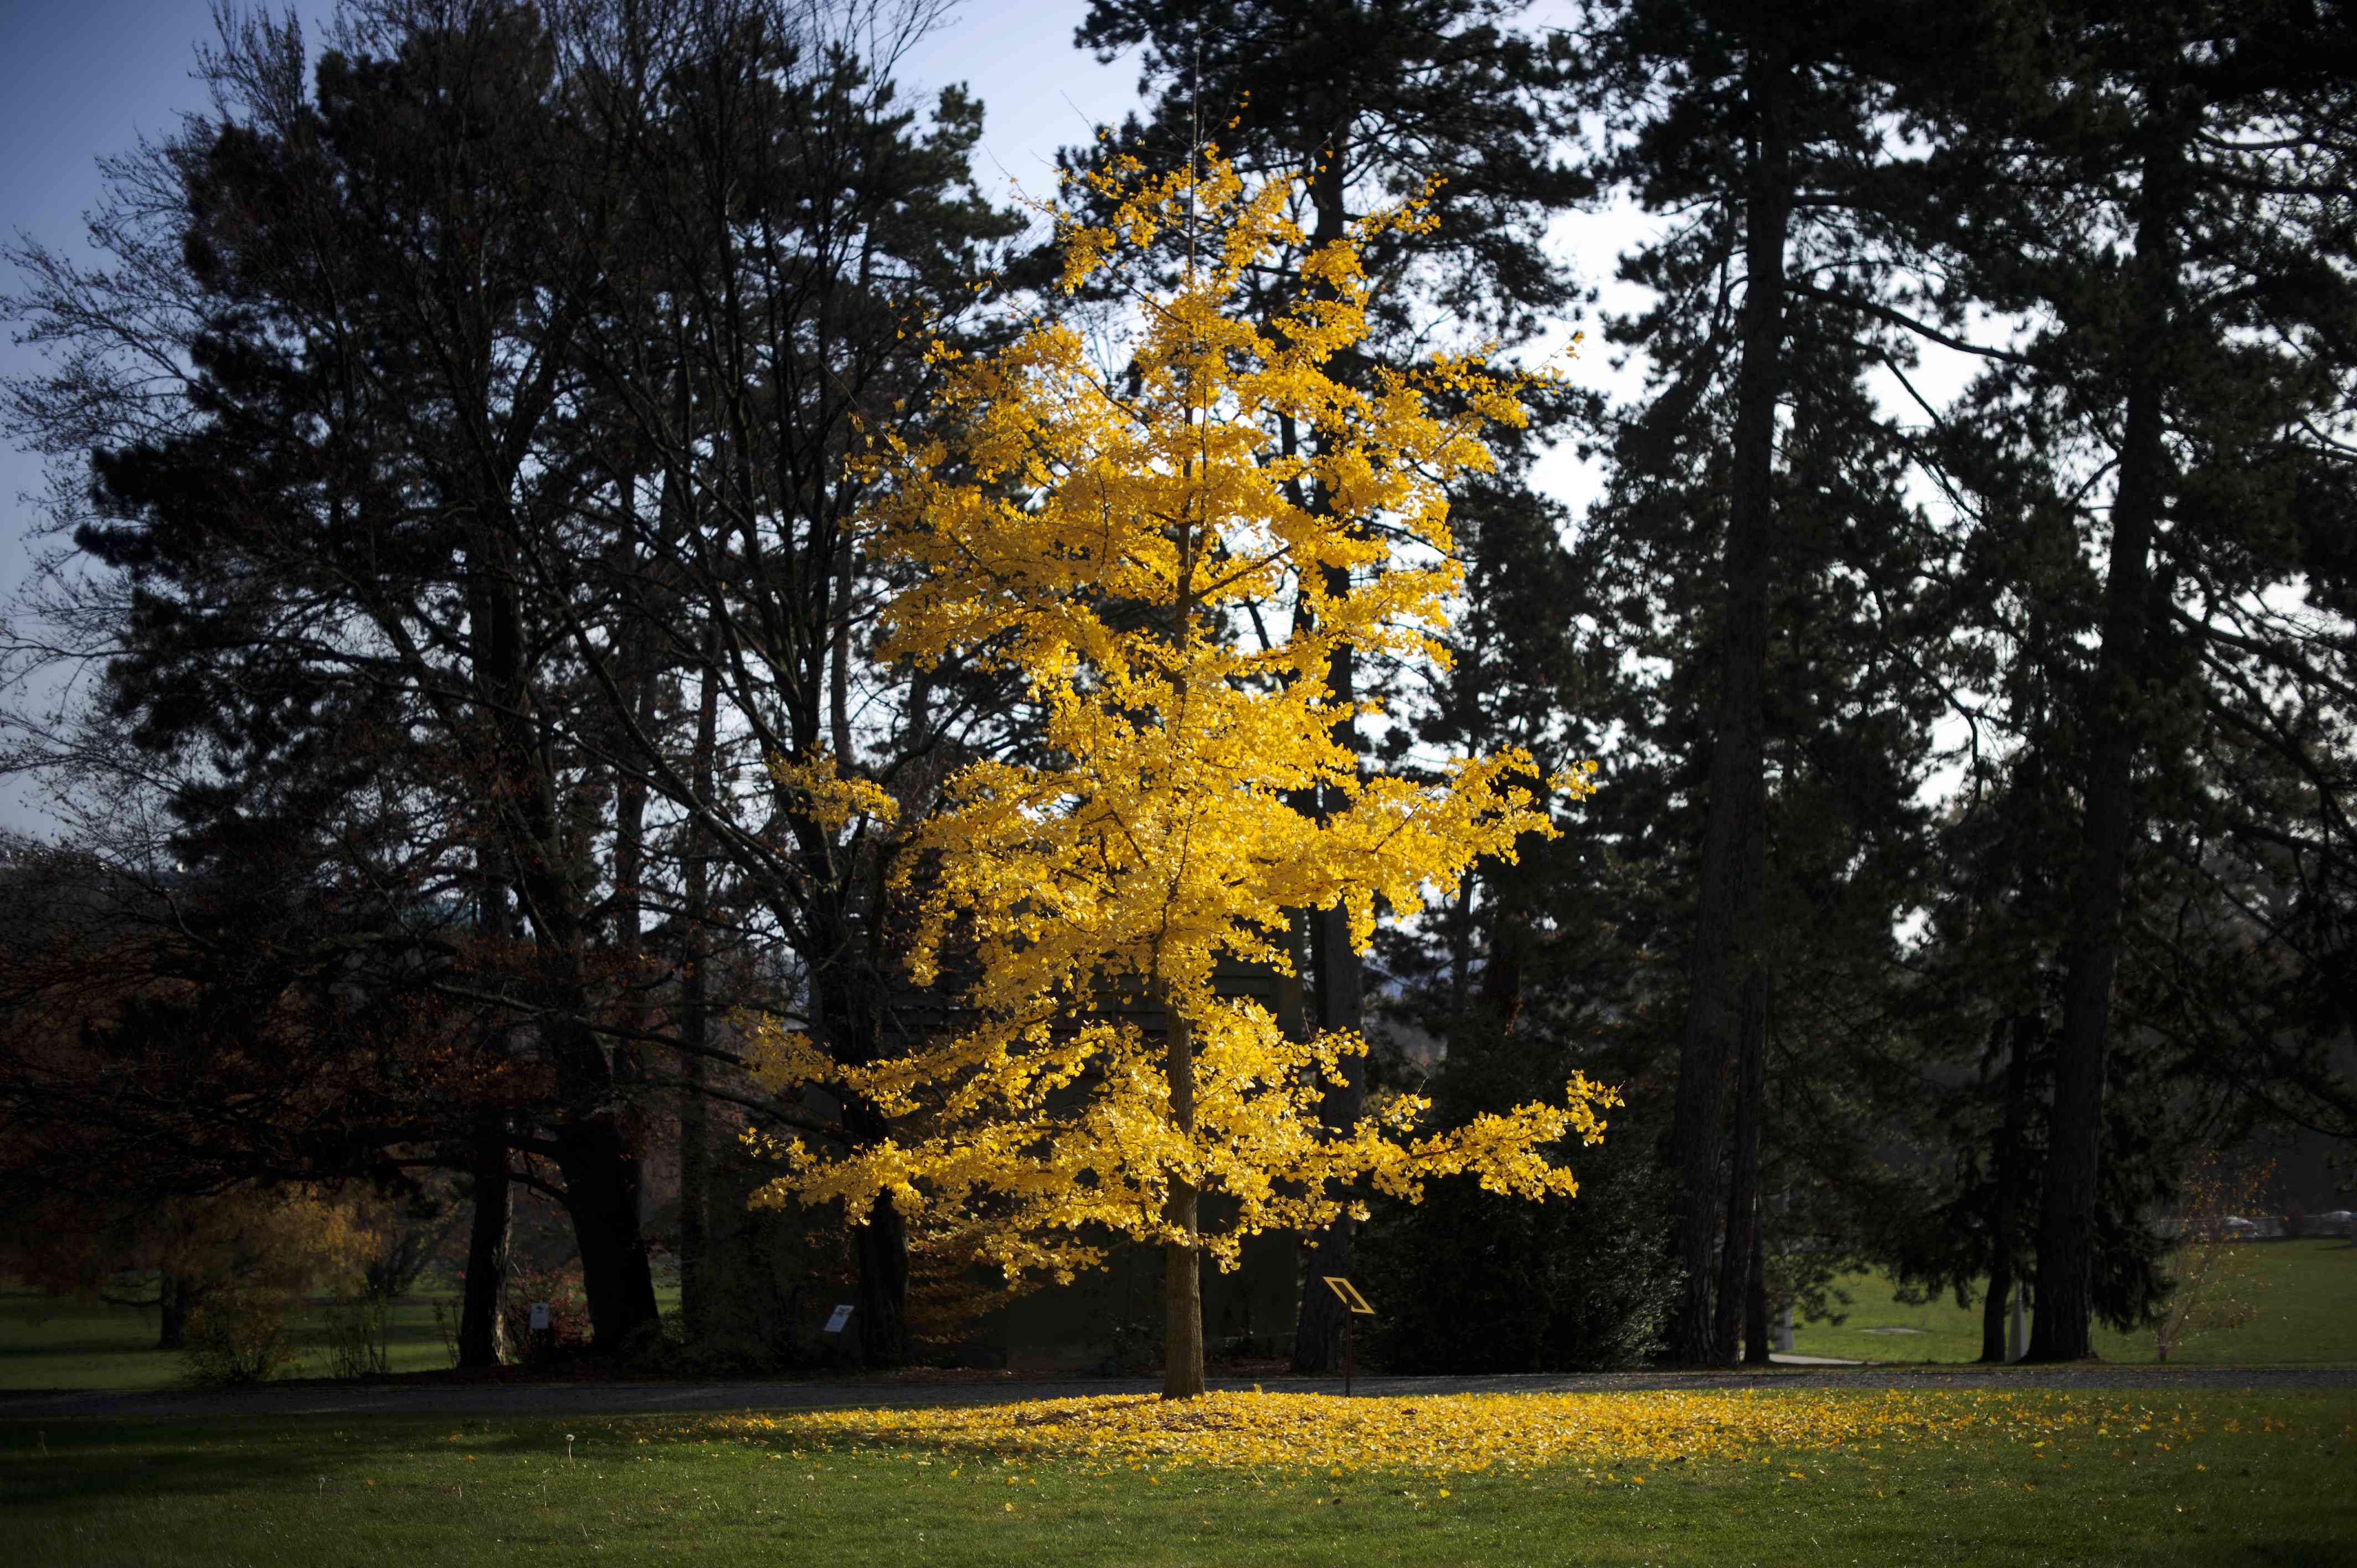 yellow ginkgo tree in Geneva